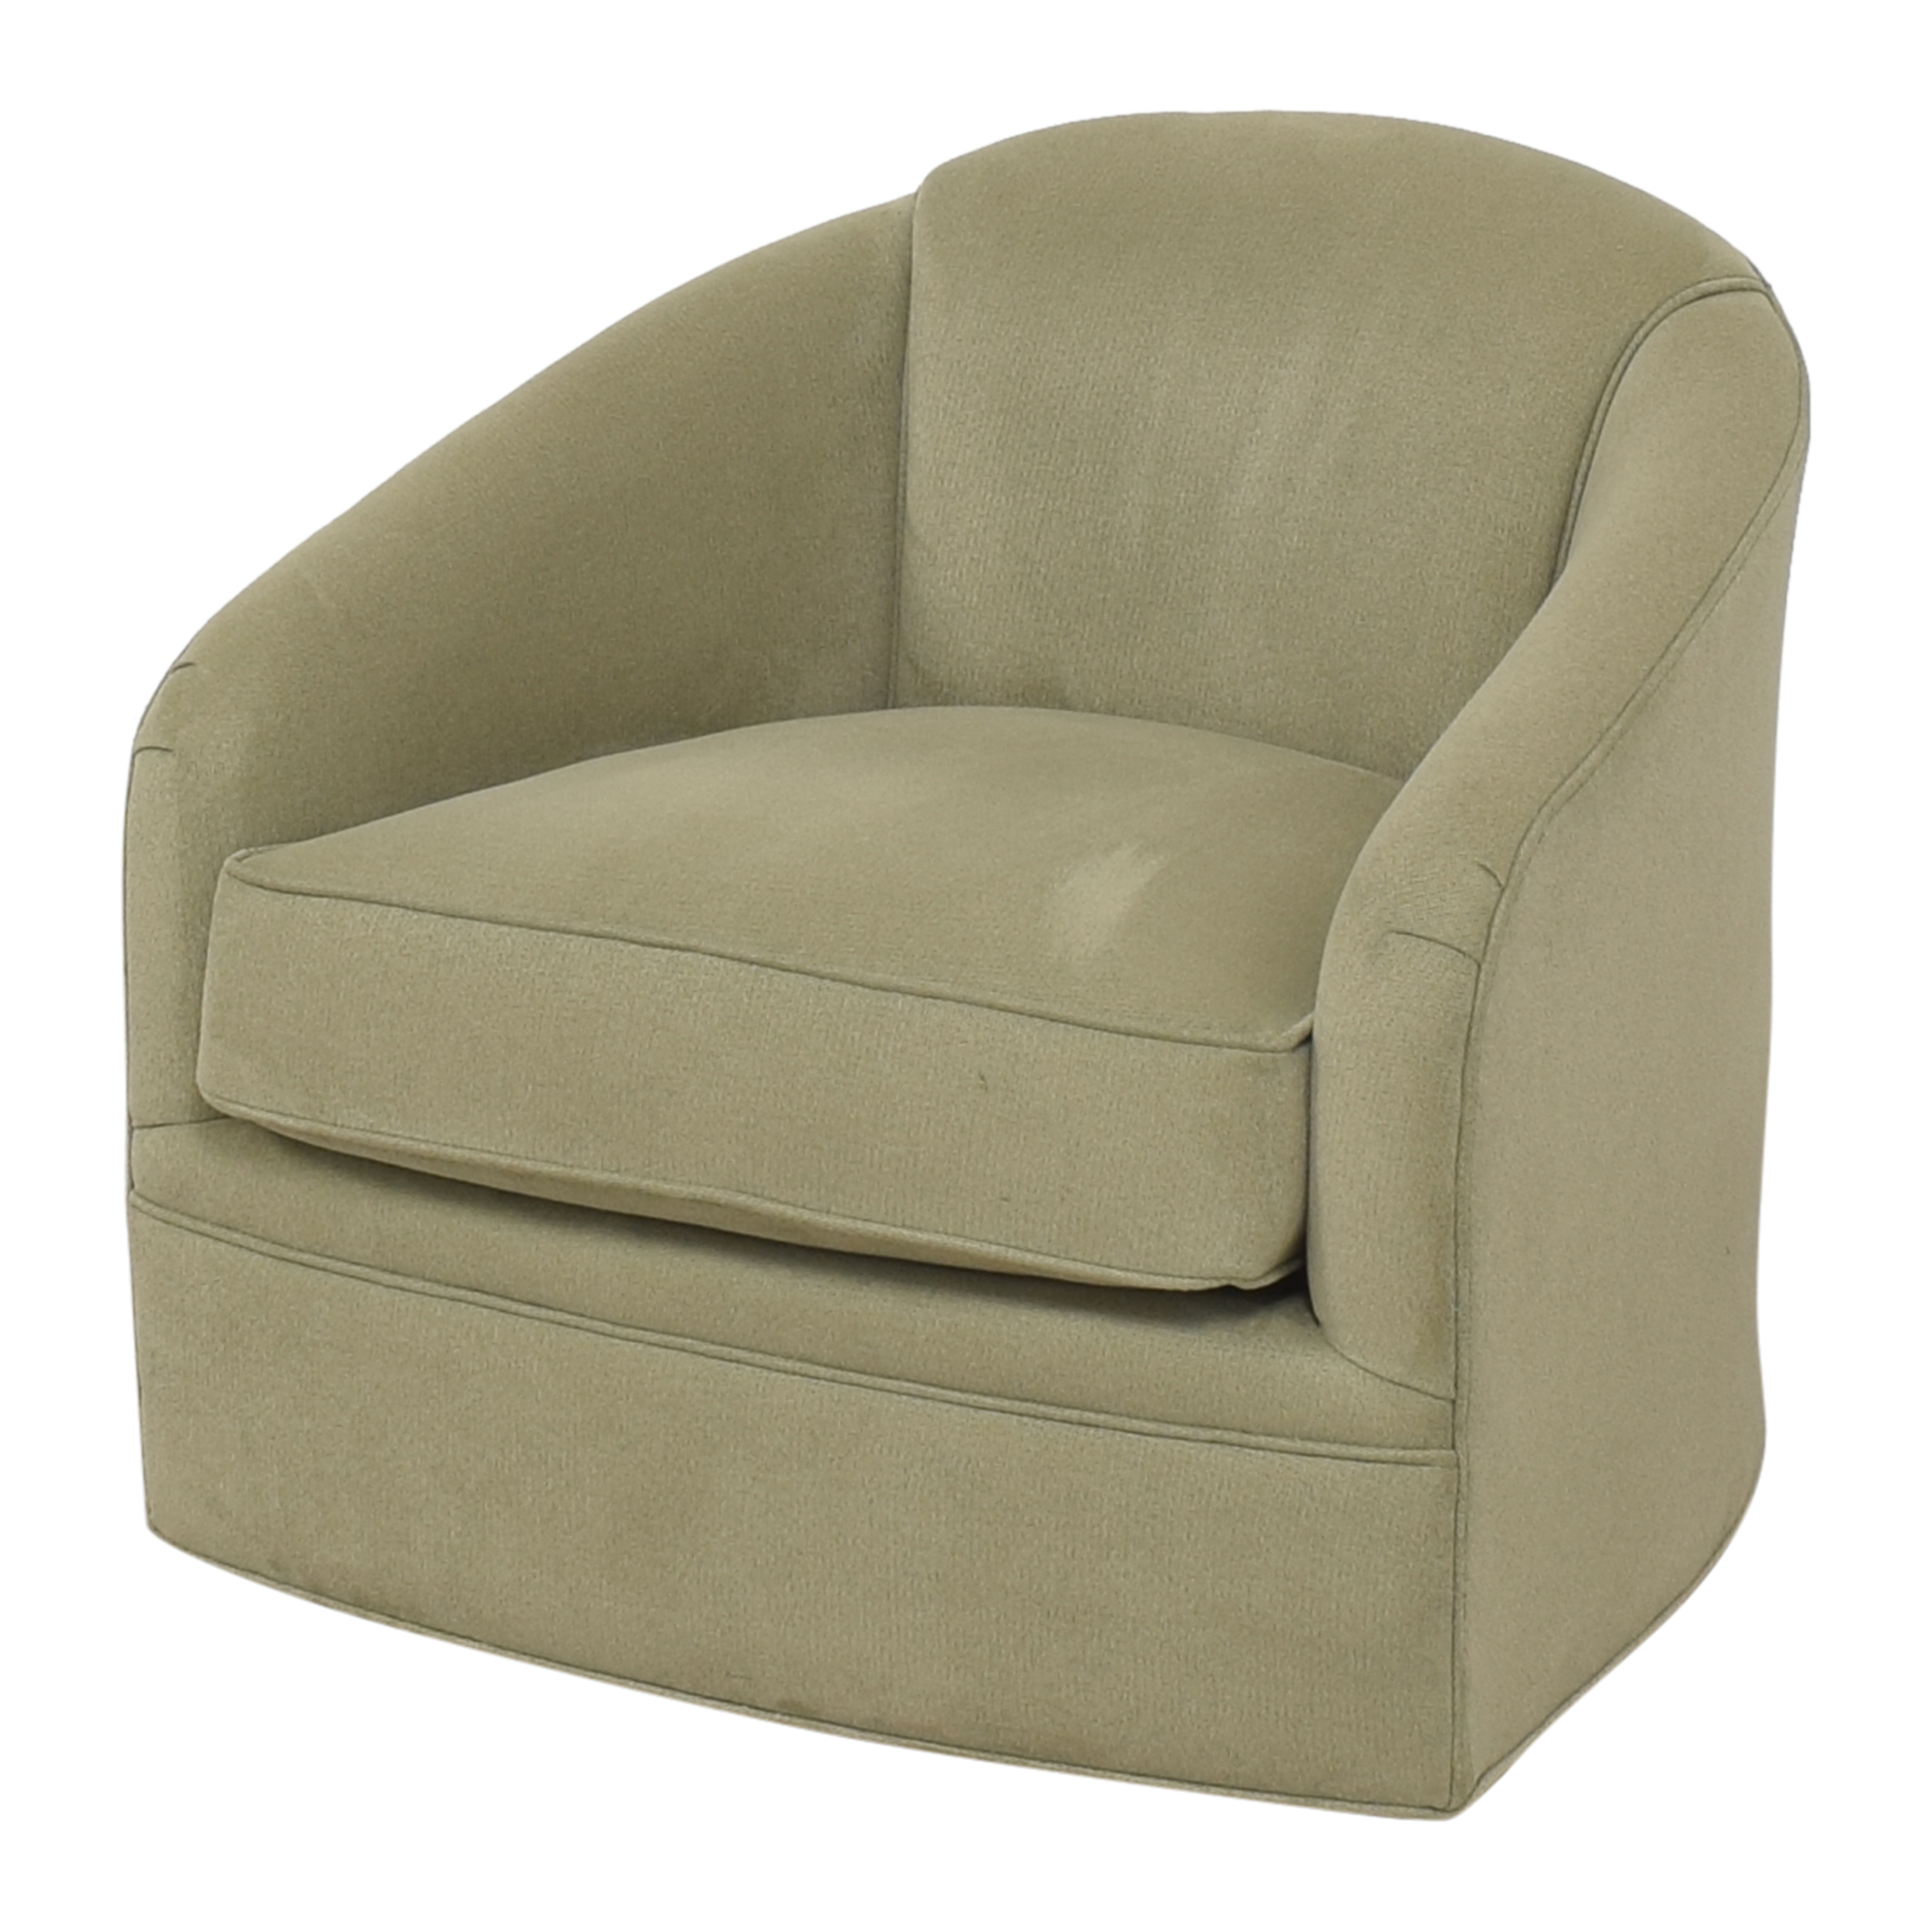 Maurice Villency Maurice Villency Cushion Tub Swivel Chair